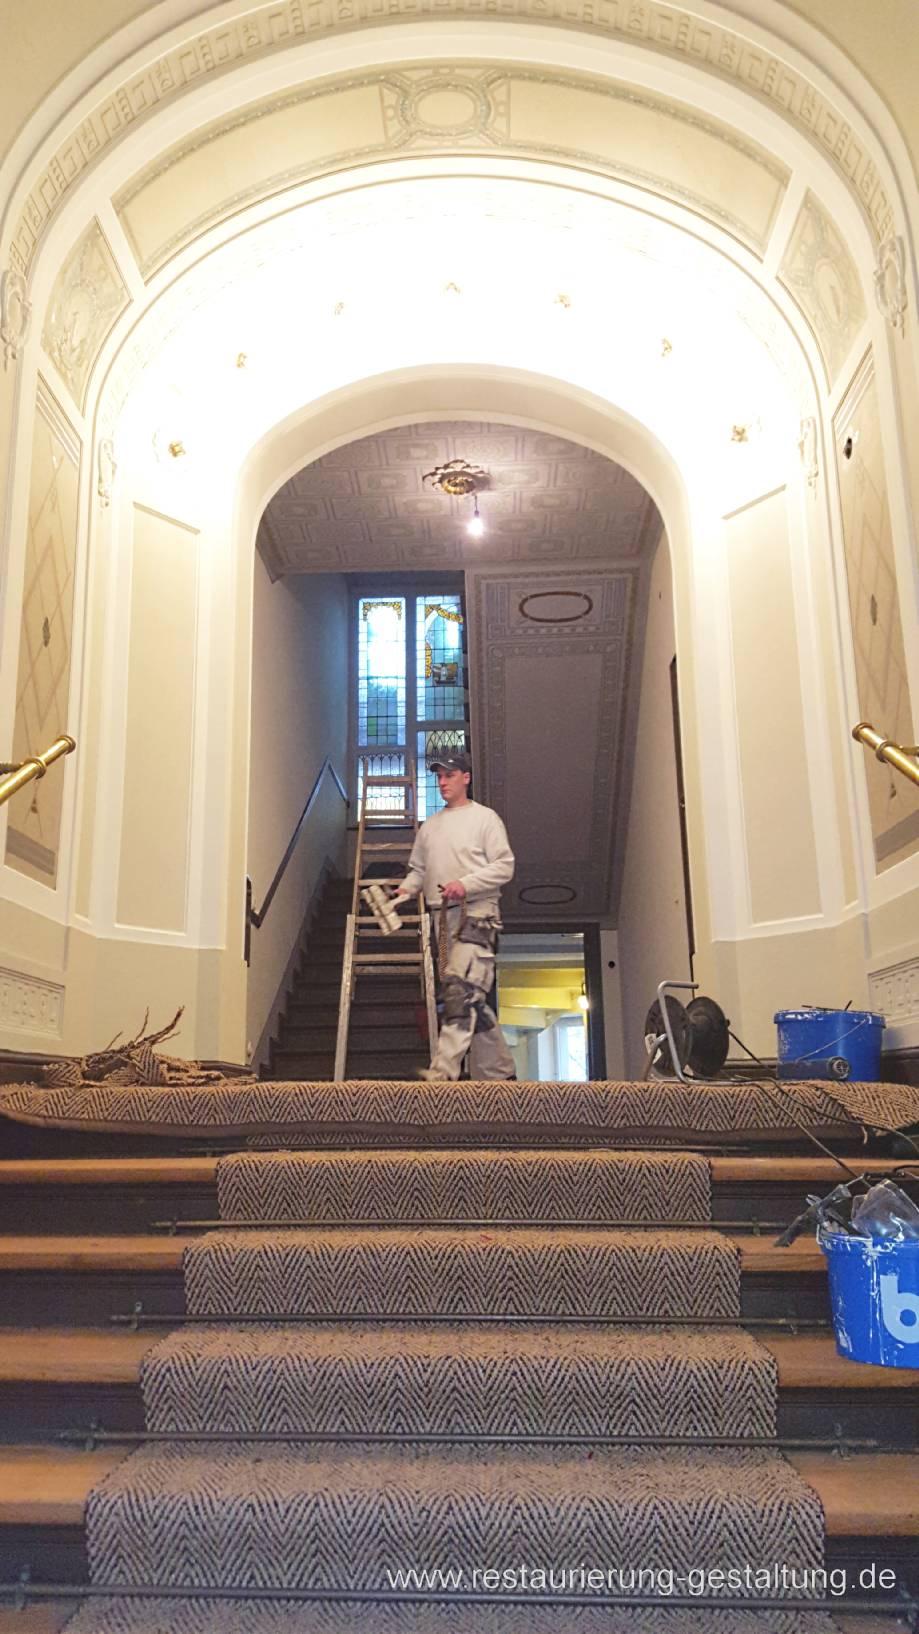 treppenhaus maler malerarbeiten restaurator. Black Bedroom Furniture Sets. Home Design Ideas